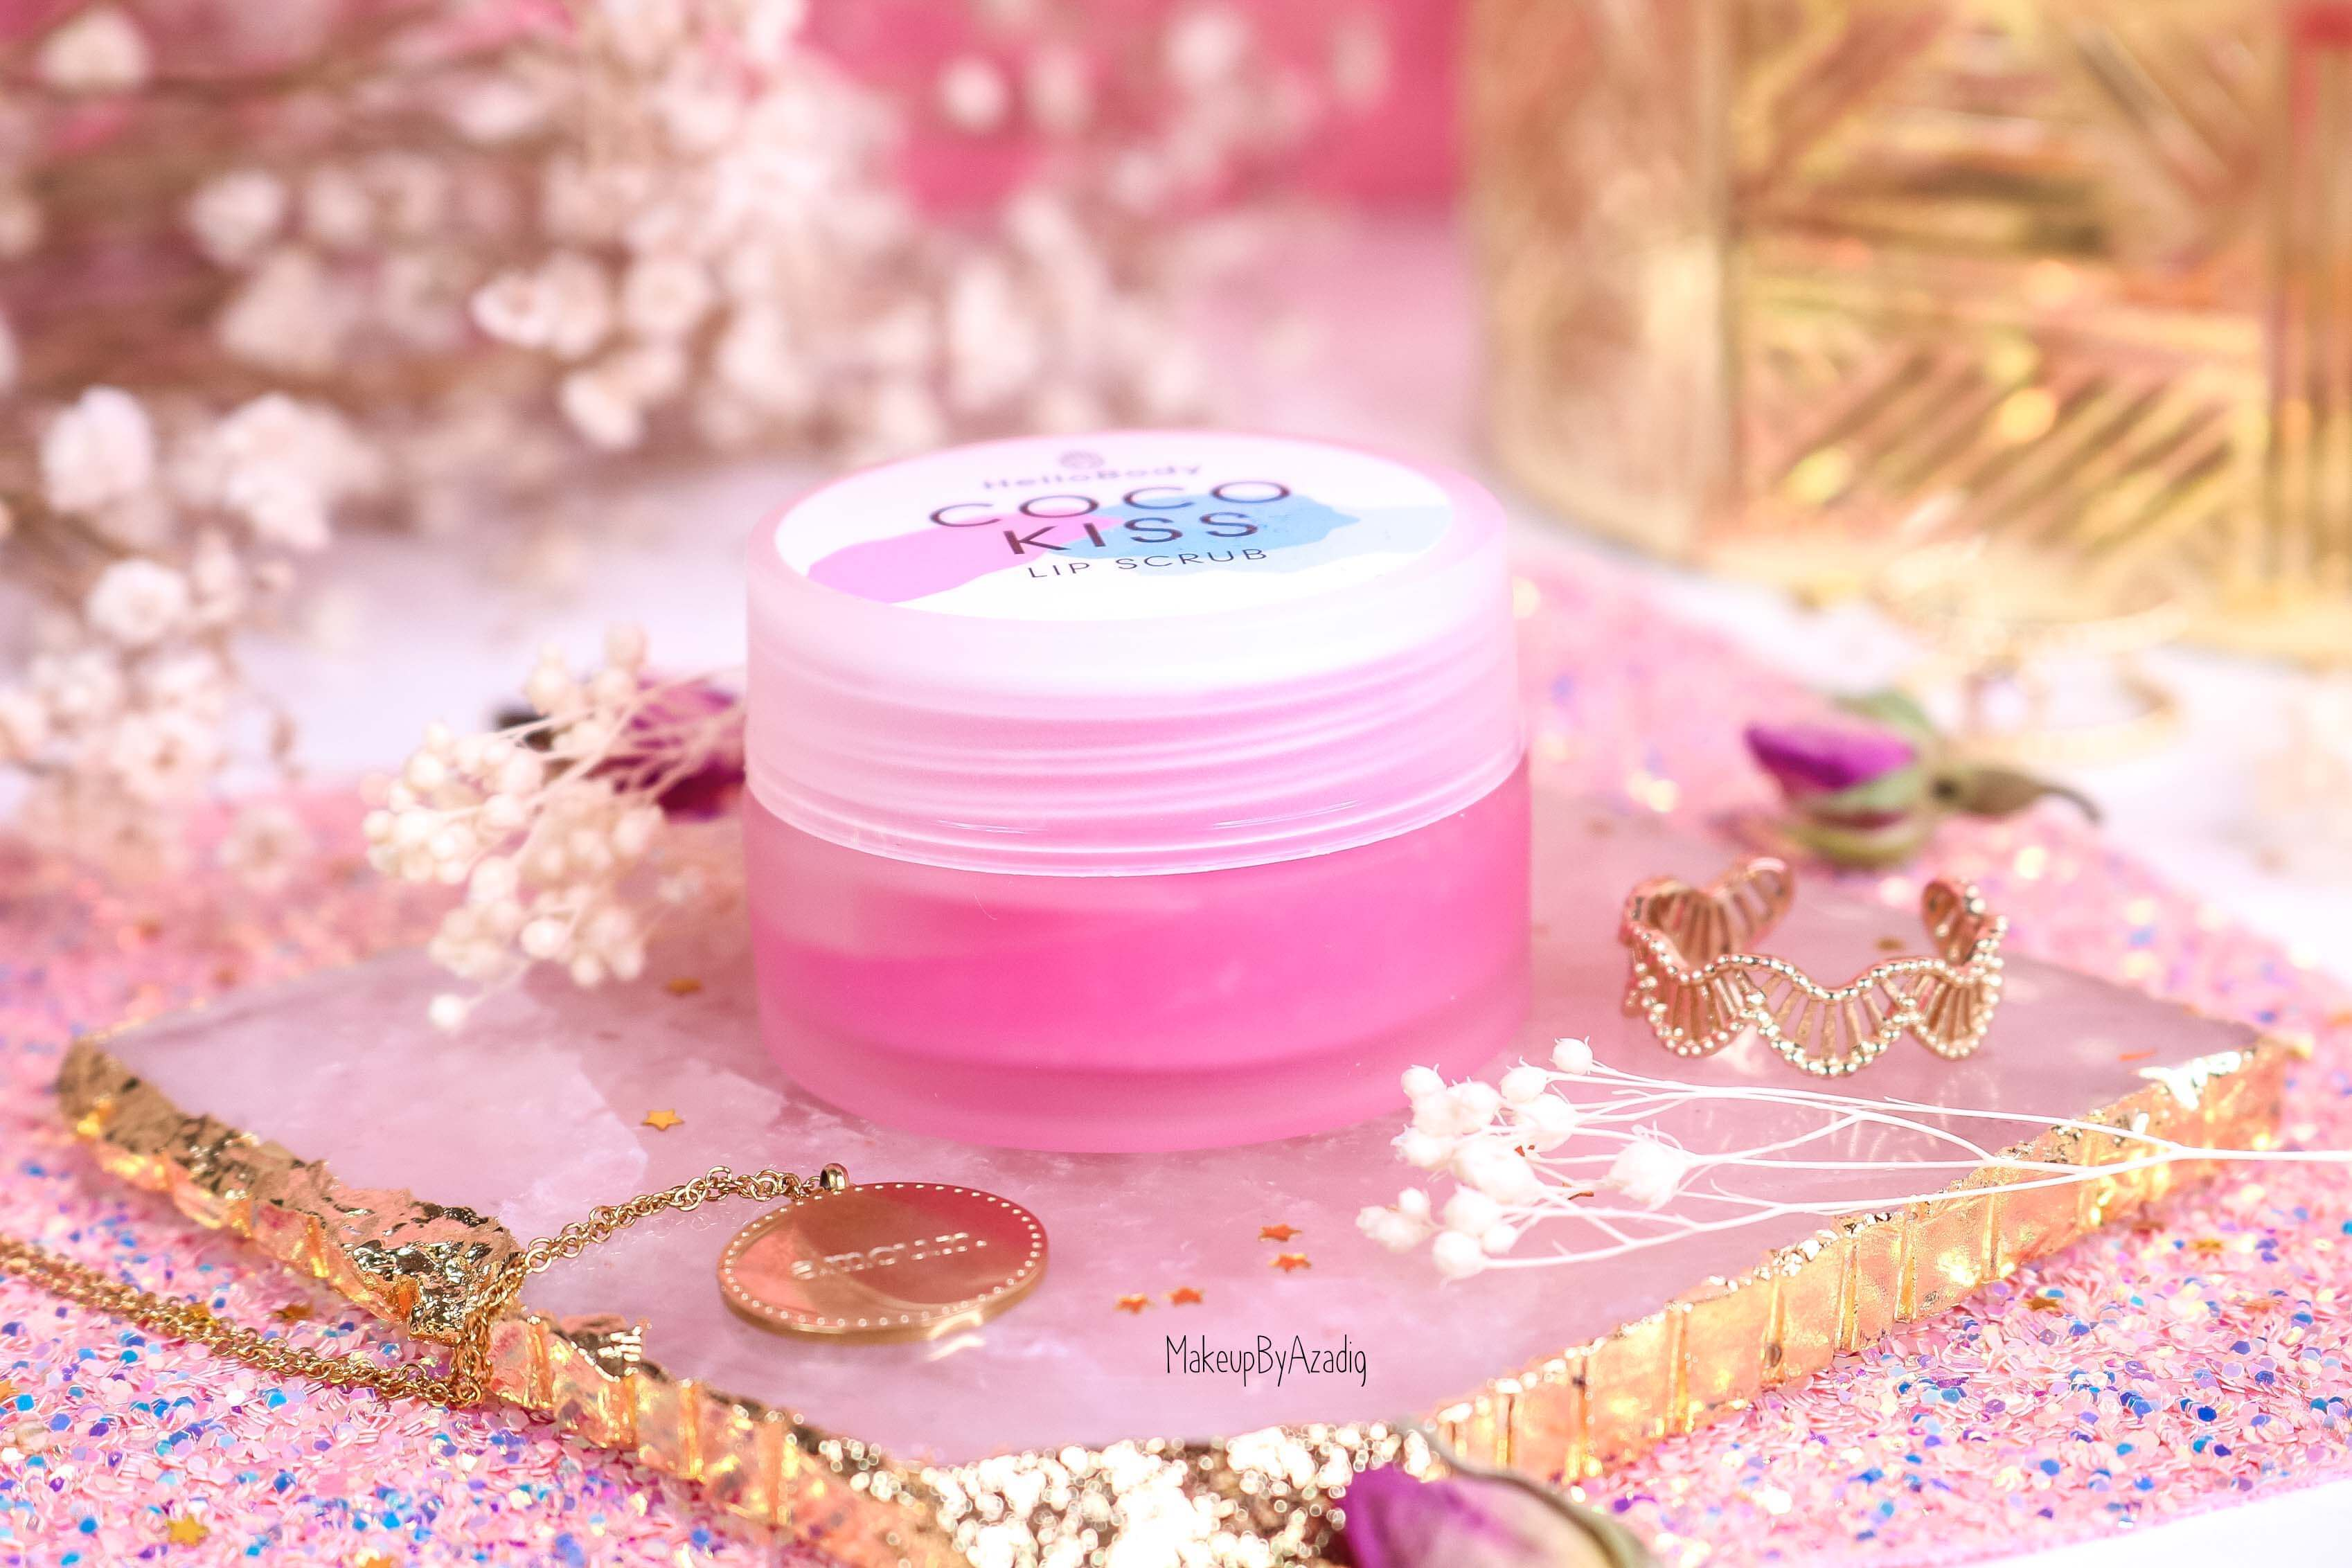 revue-baume-gommage-levres-coco-kiss-hellobody-avis-prix-swatch-makeupbyazadig-efficacite-lip-scrub-pot